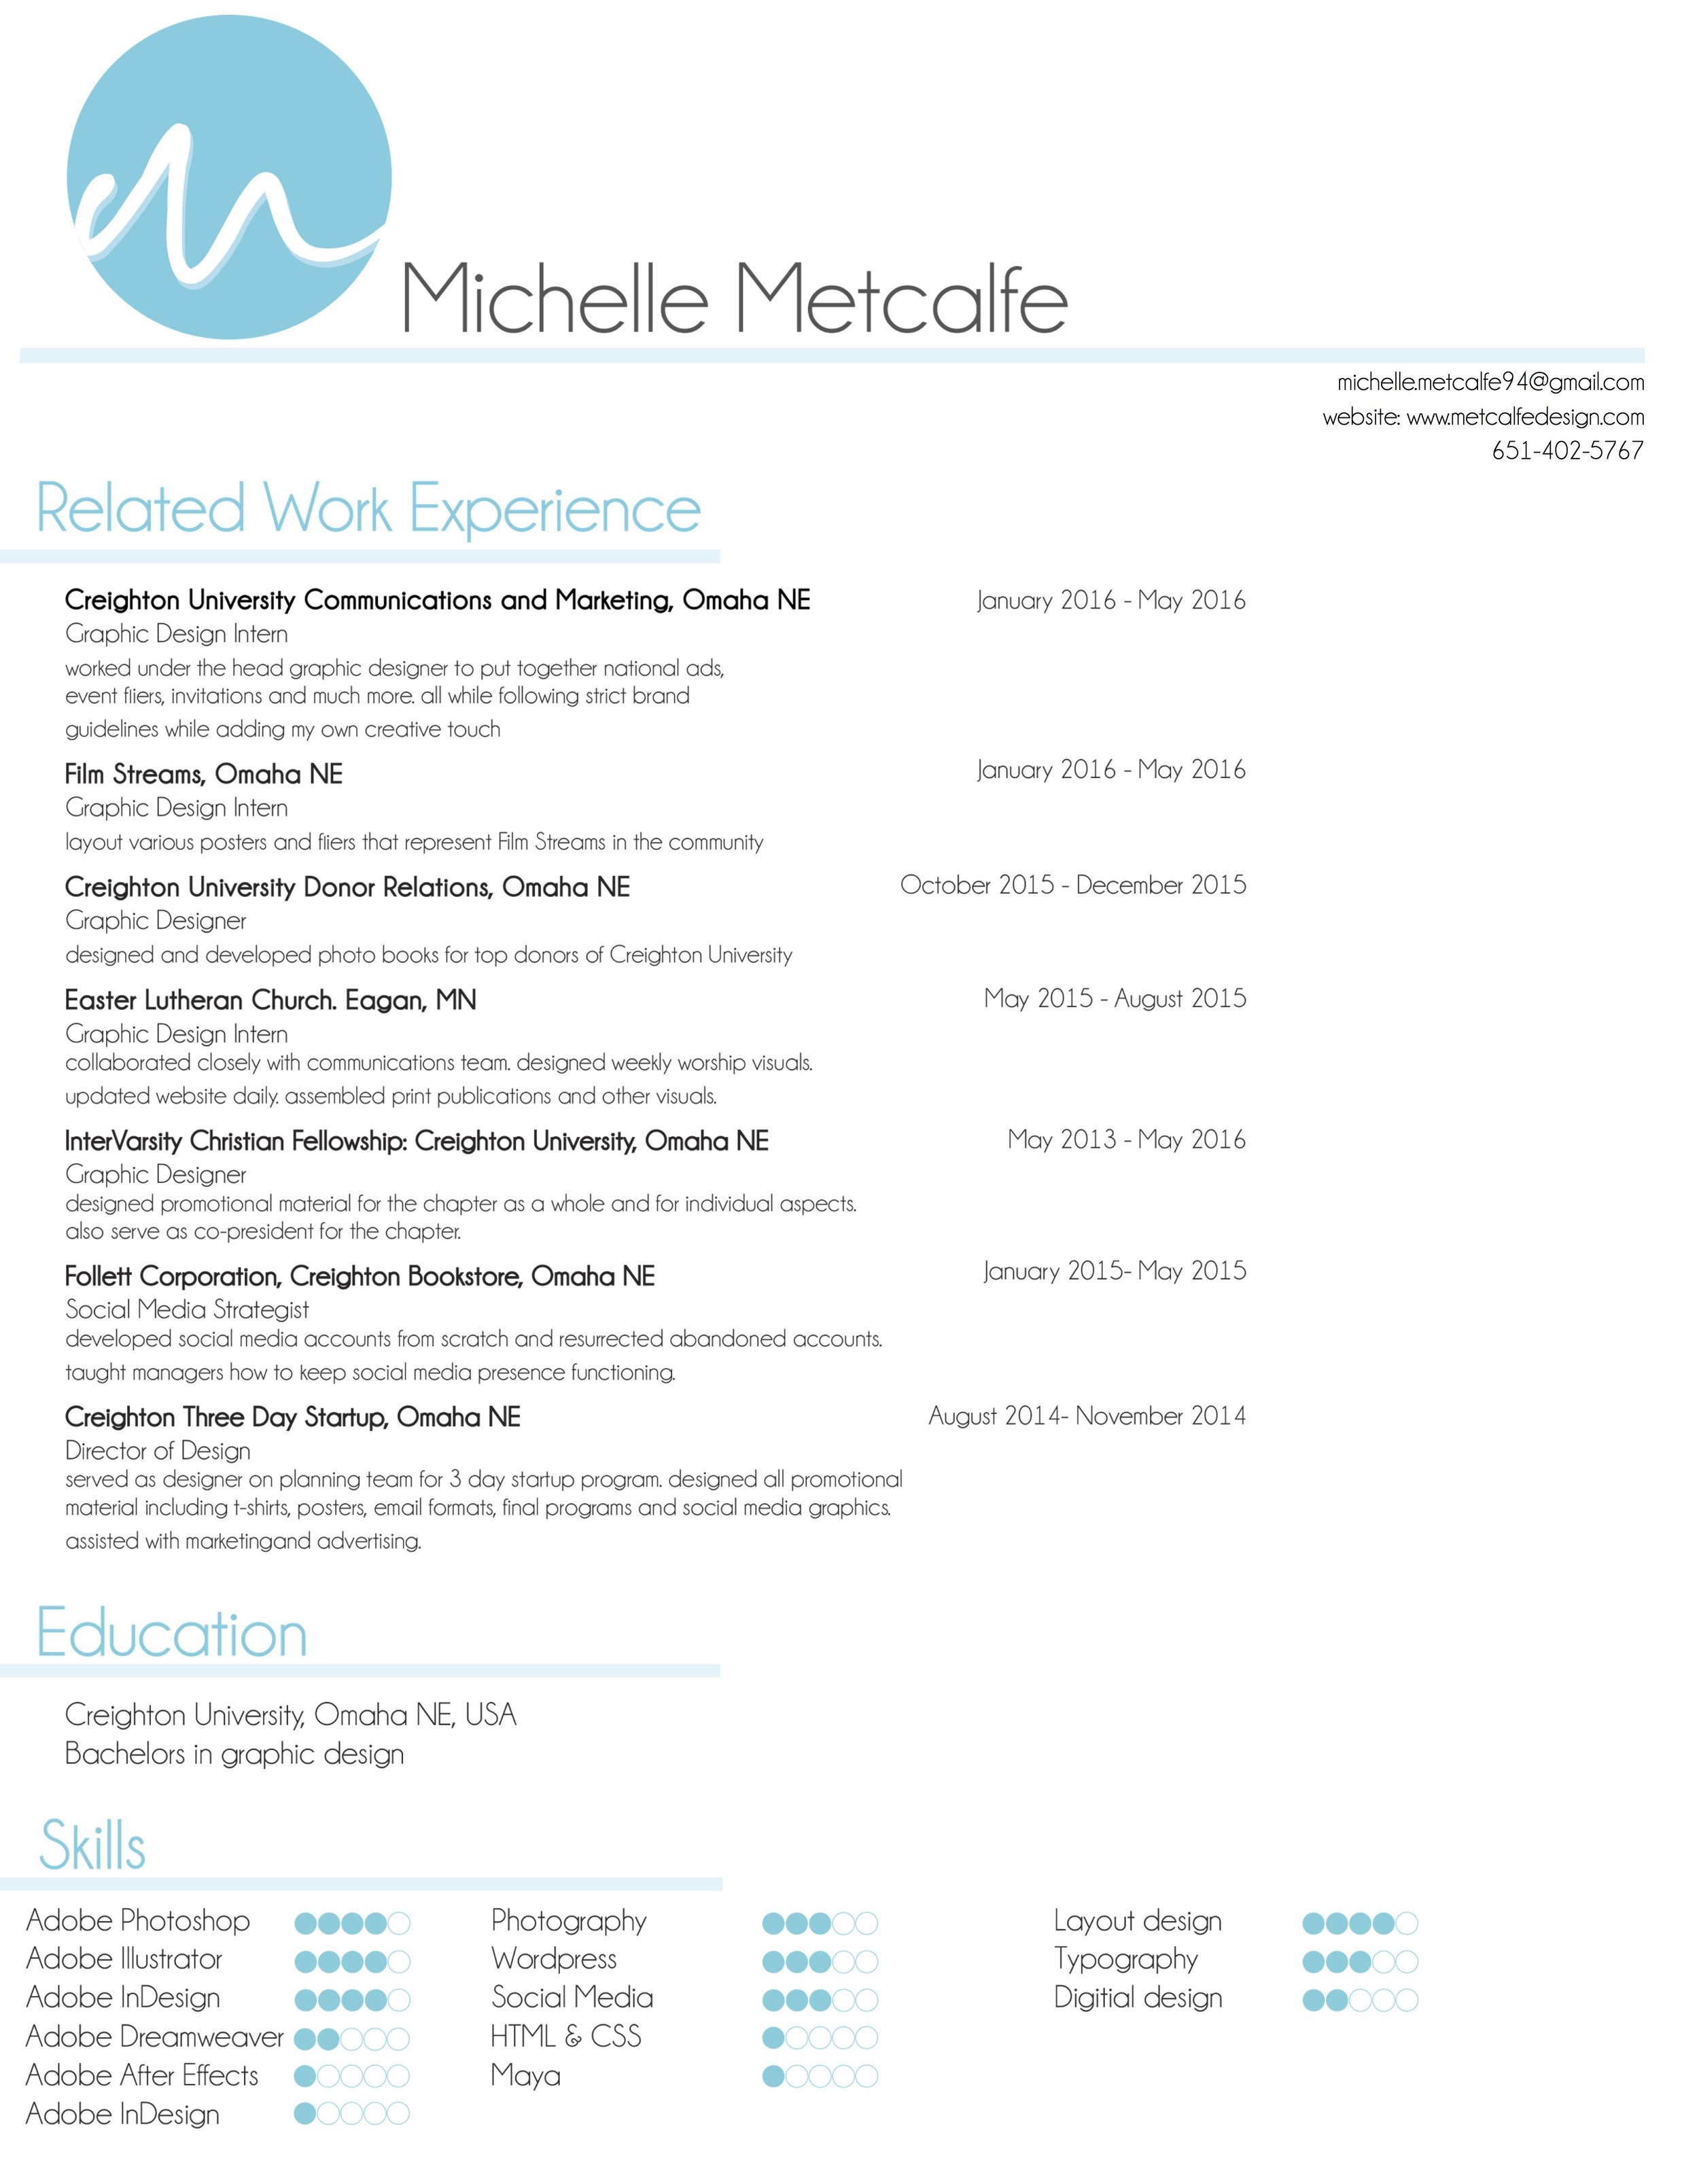 Resume_metcalfe copy 2.jpg